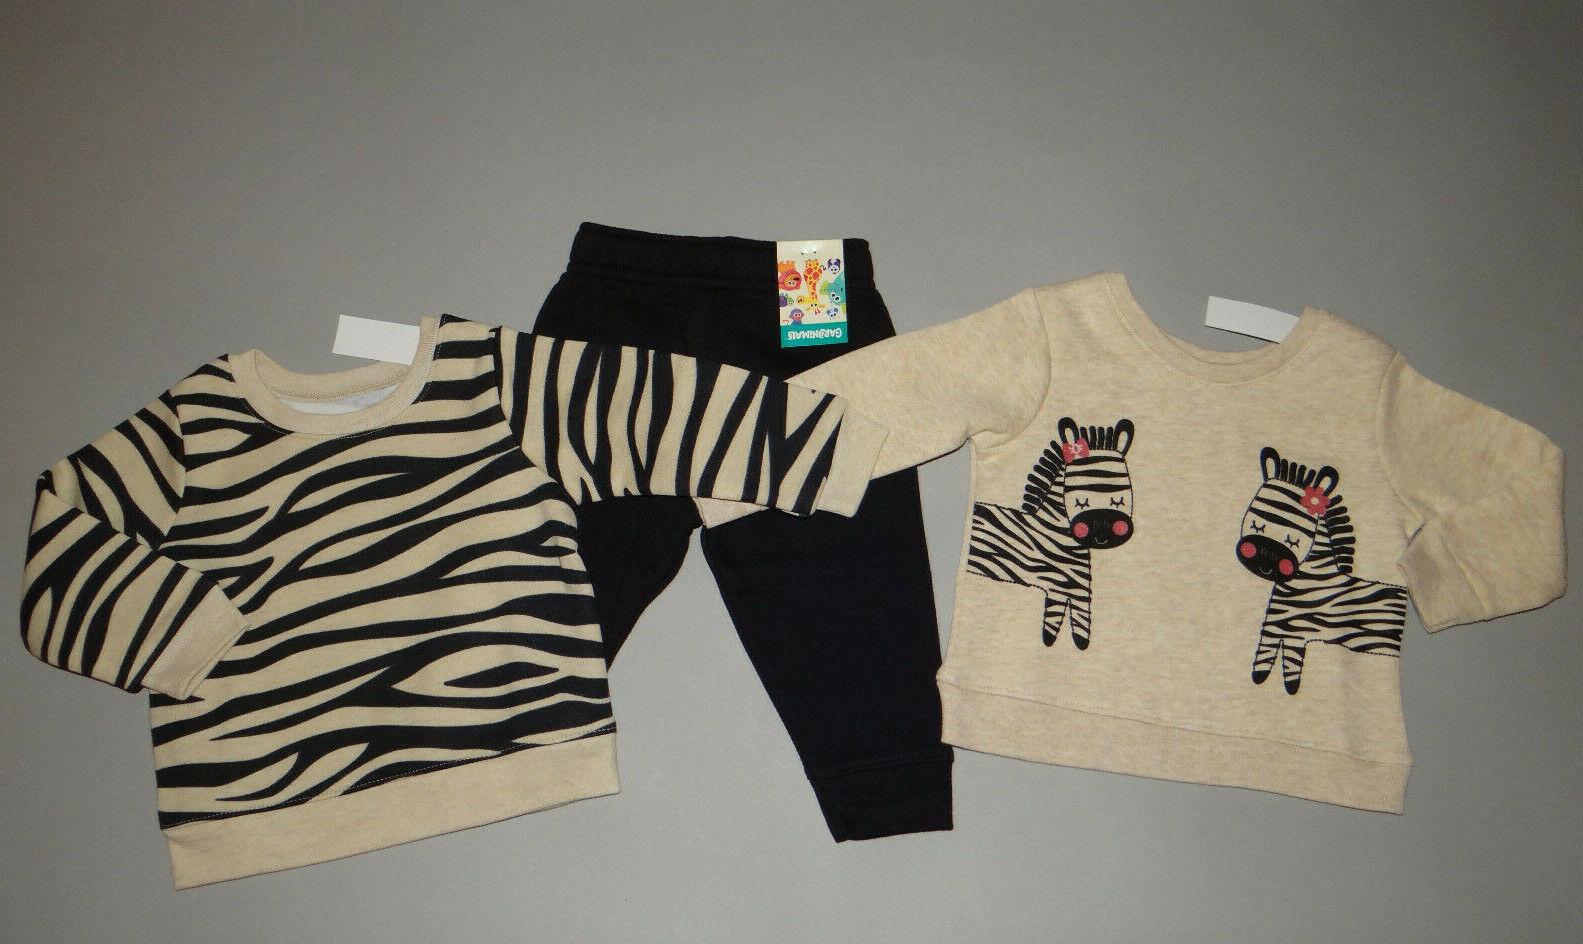 NWT, Baby girl clothes, 6-12 months, Garanimals sweatshirts/pants